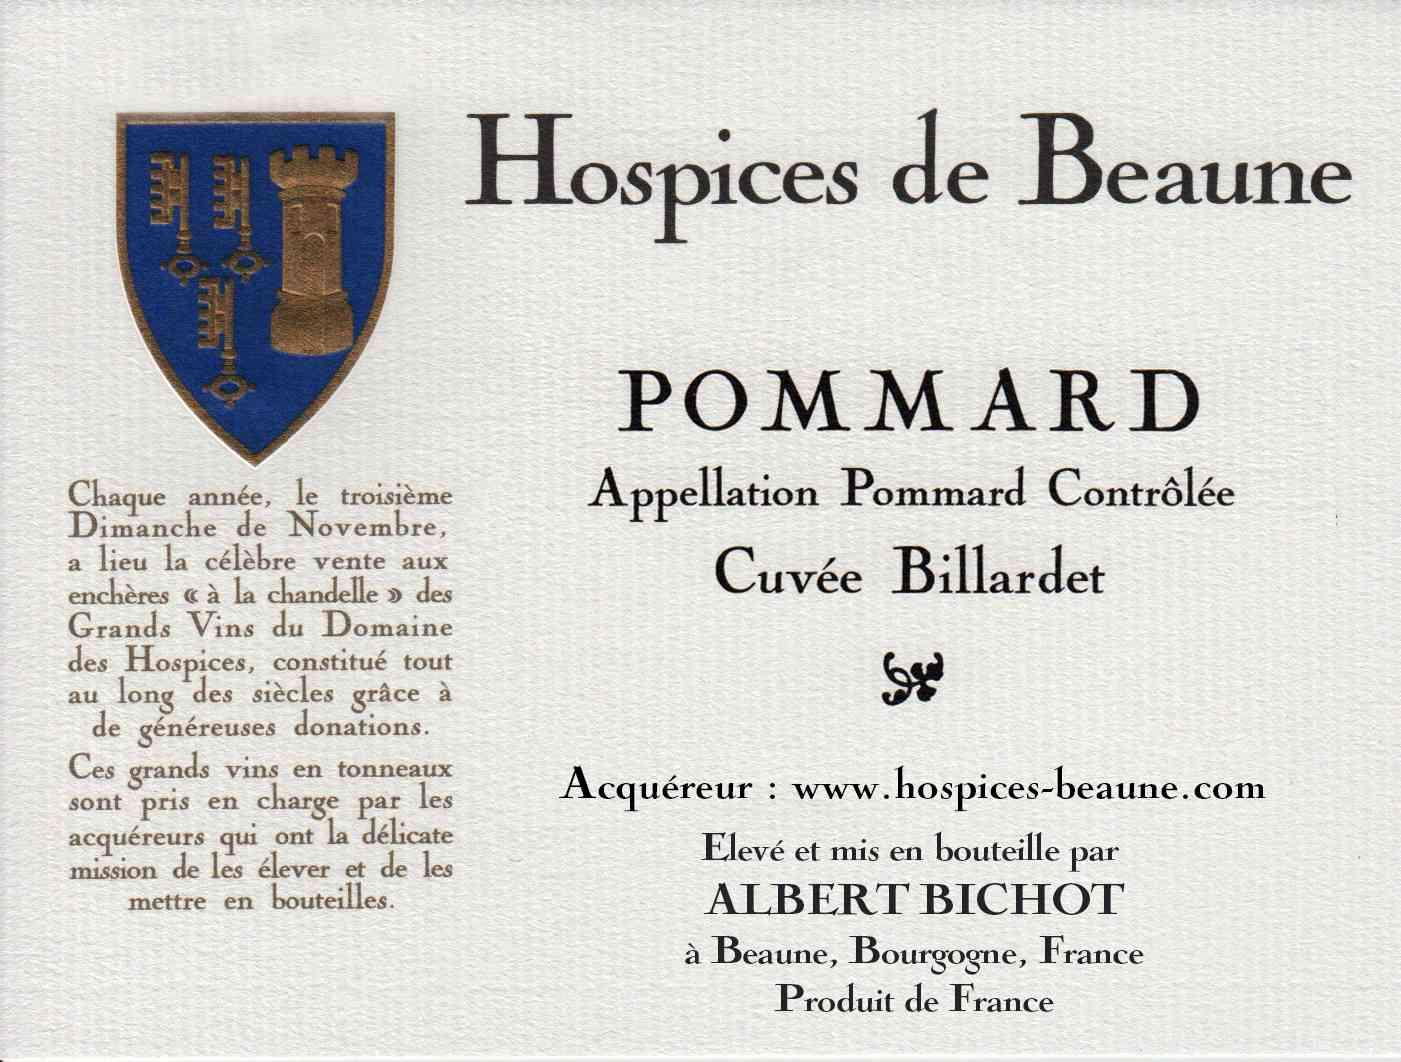 Encheres-auction-HospicesdeBeaune-AlbertBichot-Pommard-Cuvee-Billardet